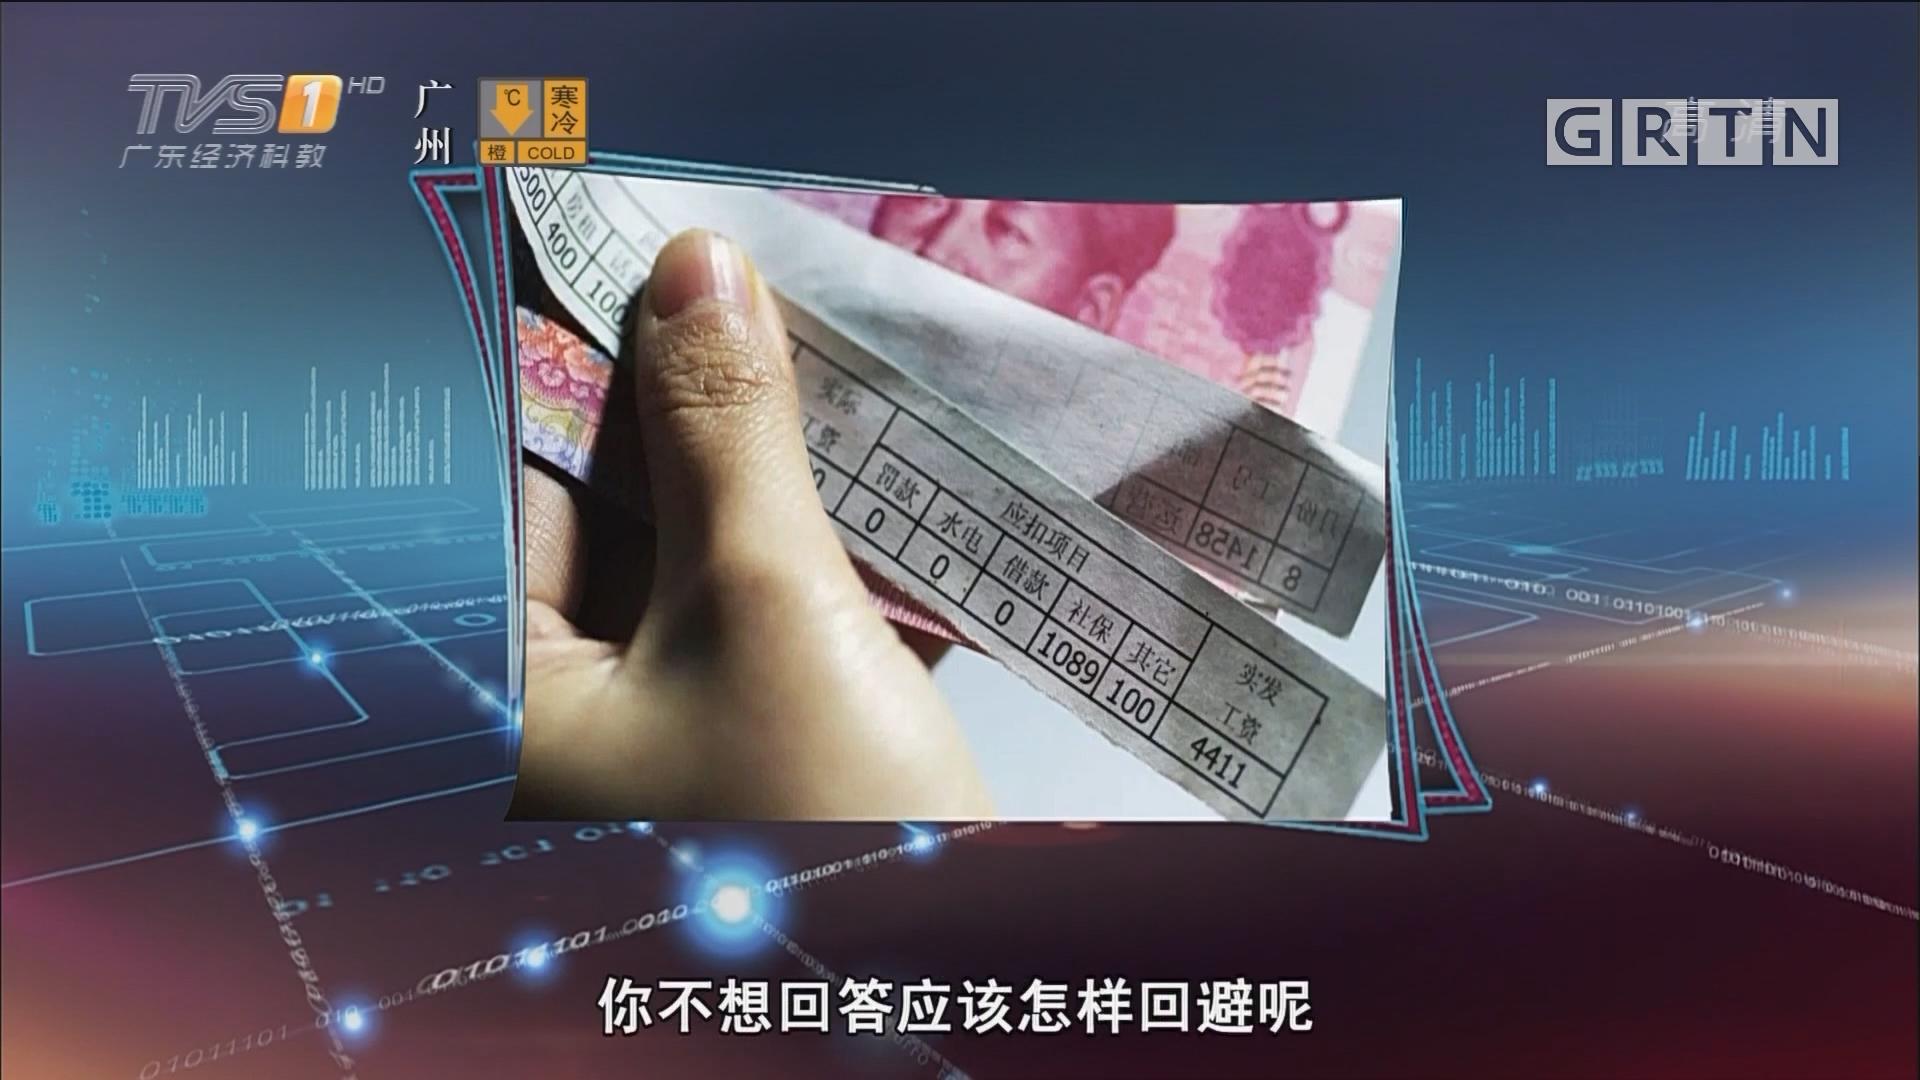 [HD][2018-12-31]马后炮:报道科技成果切莫夸大其词 成自嗨文